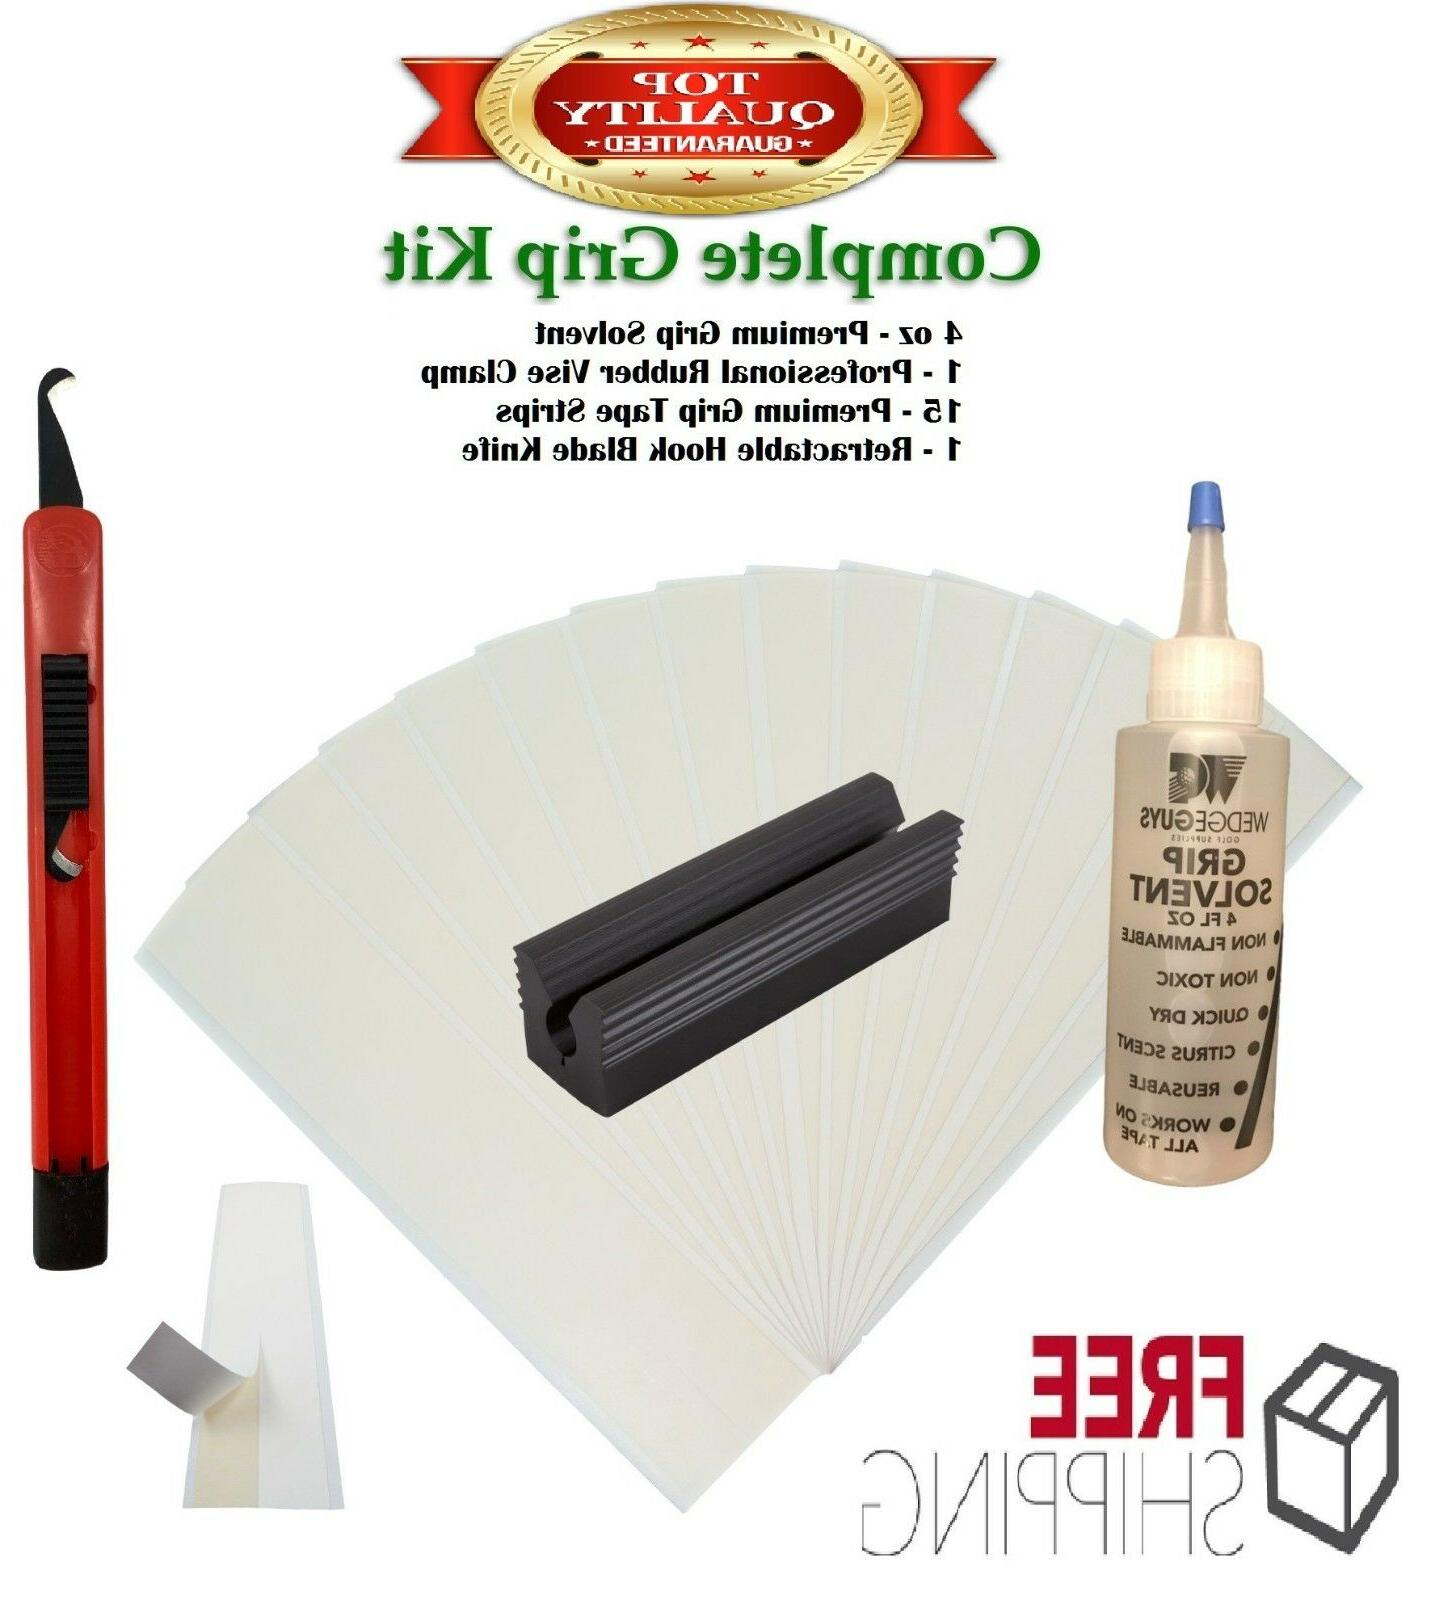 golf club grip kit 15 tape strips